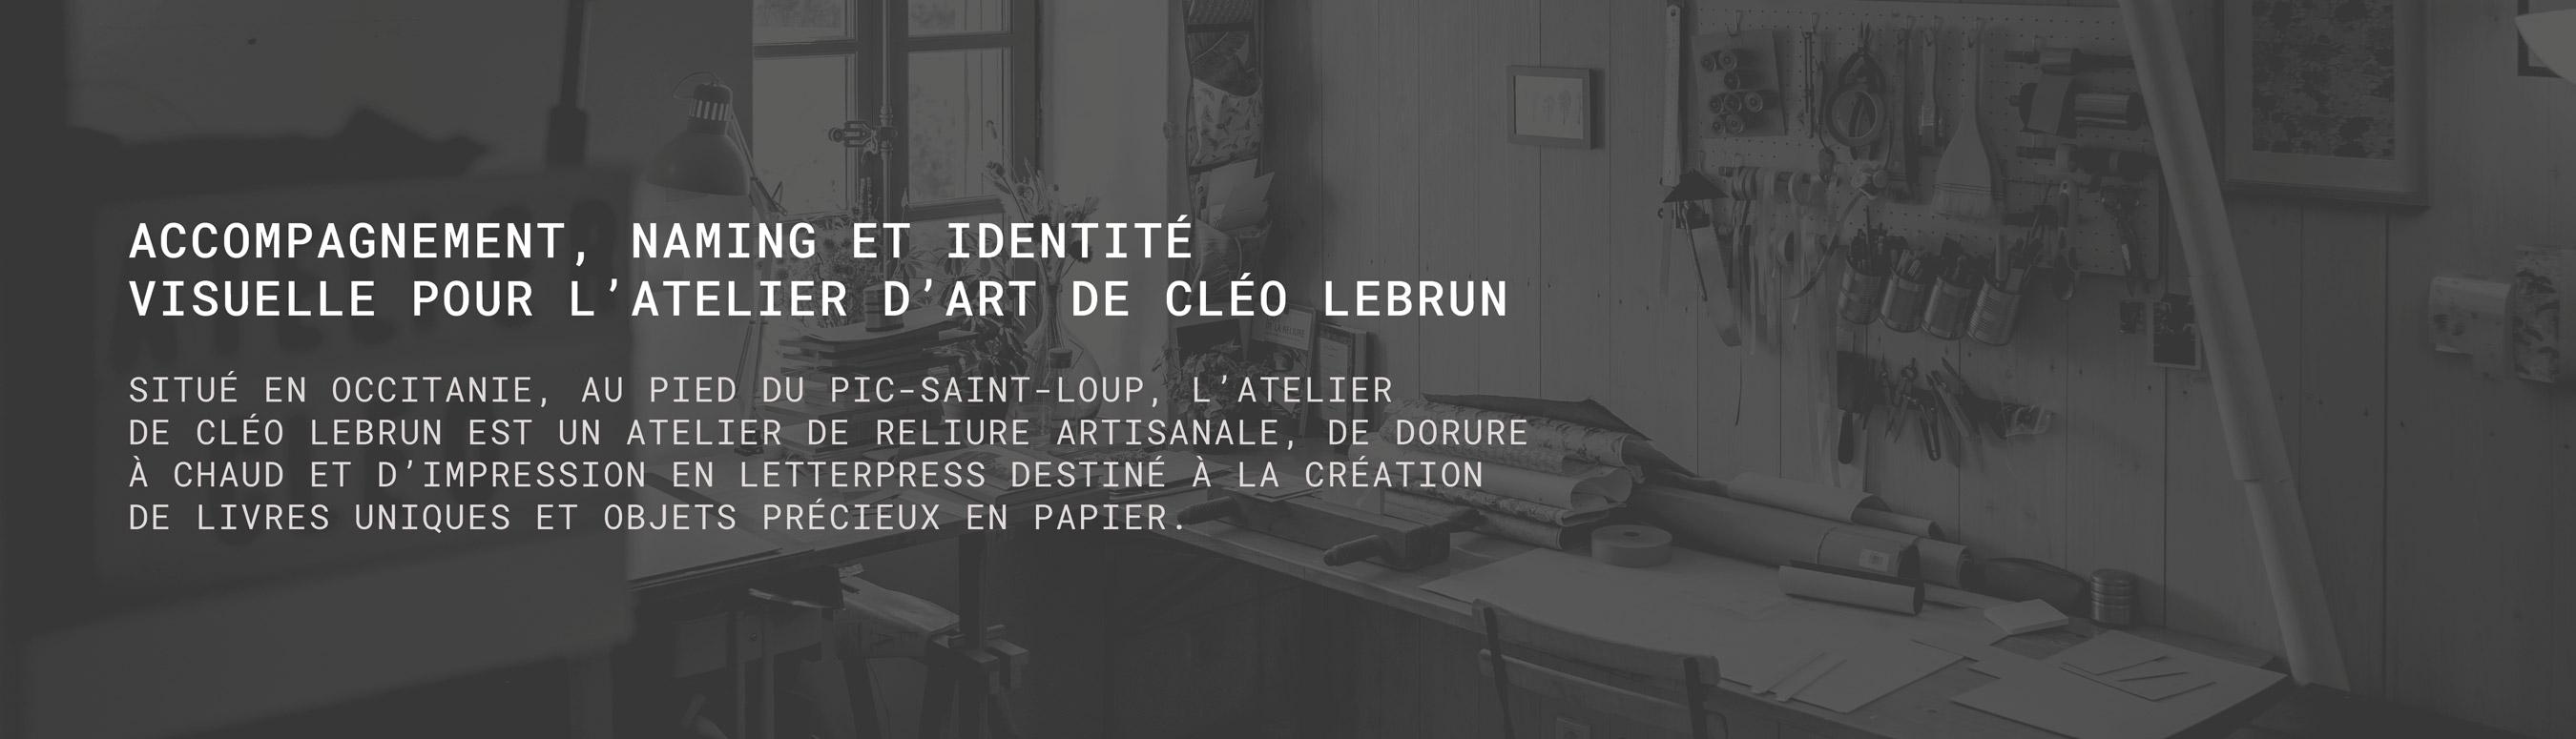 Atelier d'art Cléo Lebrun 1